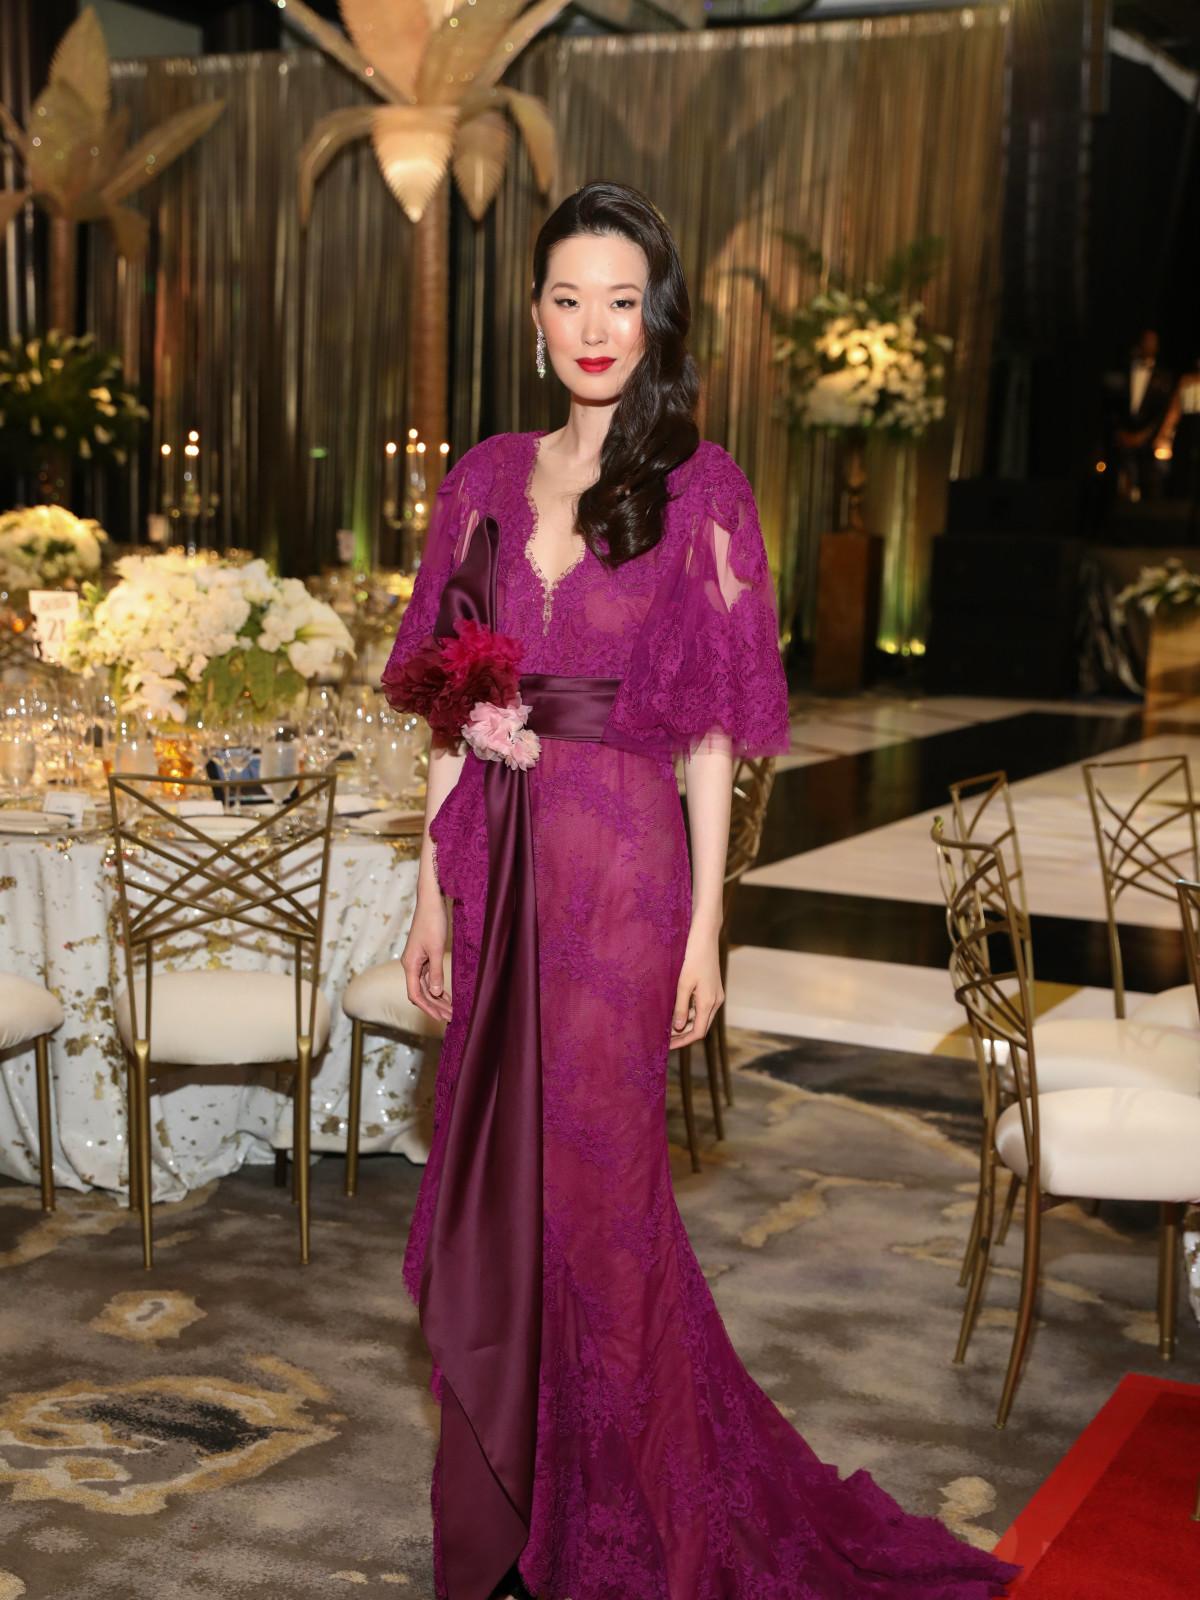 Opera Ball gowns Sophia Lee in Marchesa